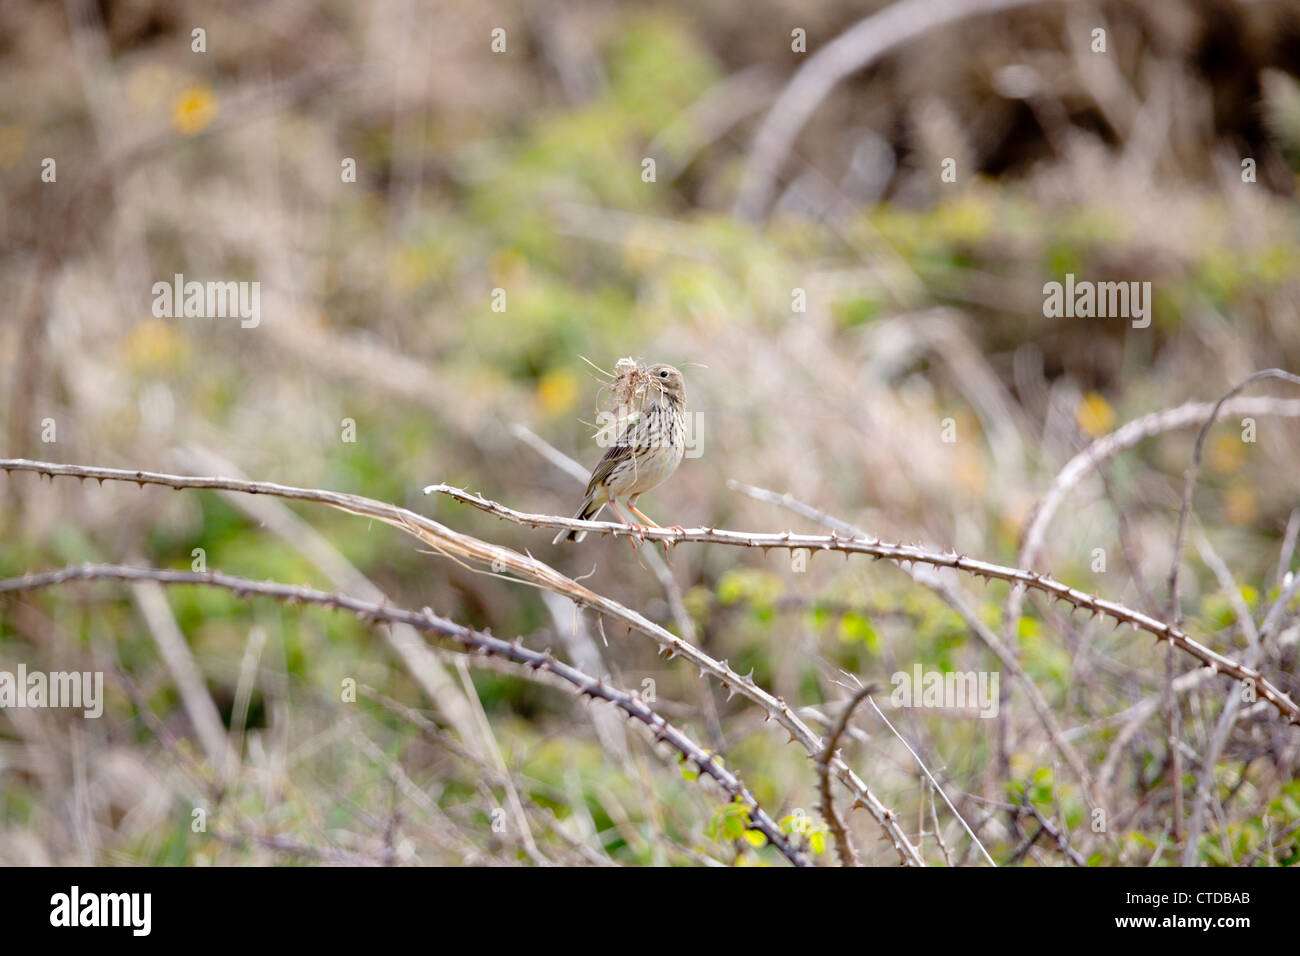 Wiese Pieper; Anthus Pratensis; mit Nistmaterial; UK Stockbild